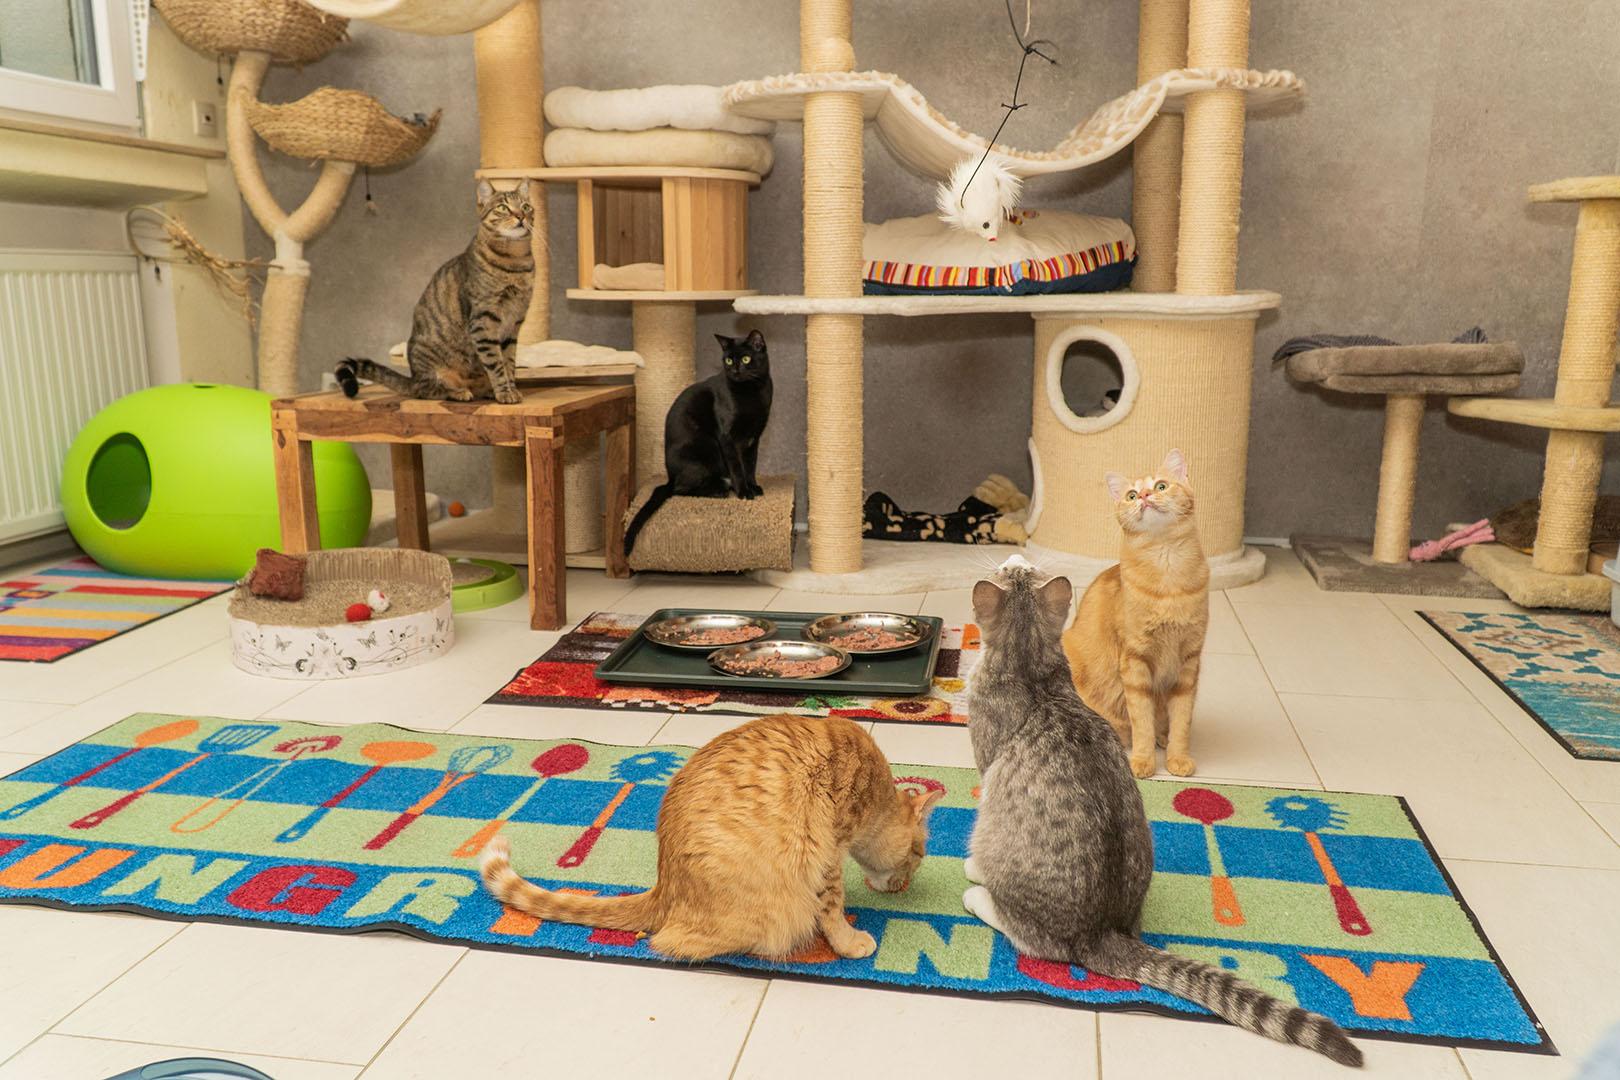 Pflegekatzen Startseite 30.10.18 (6)